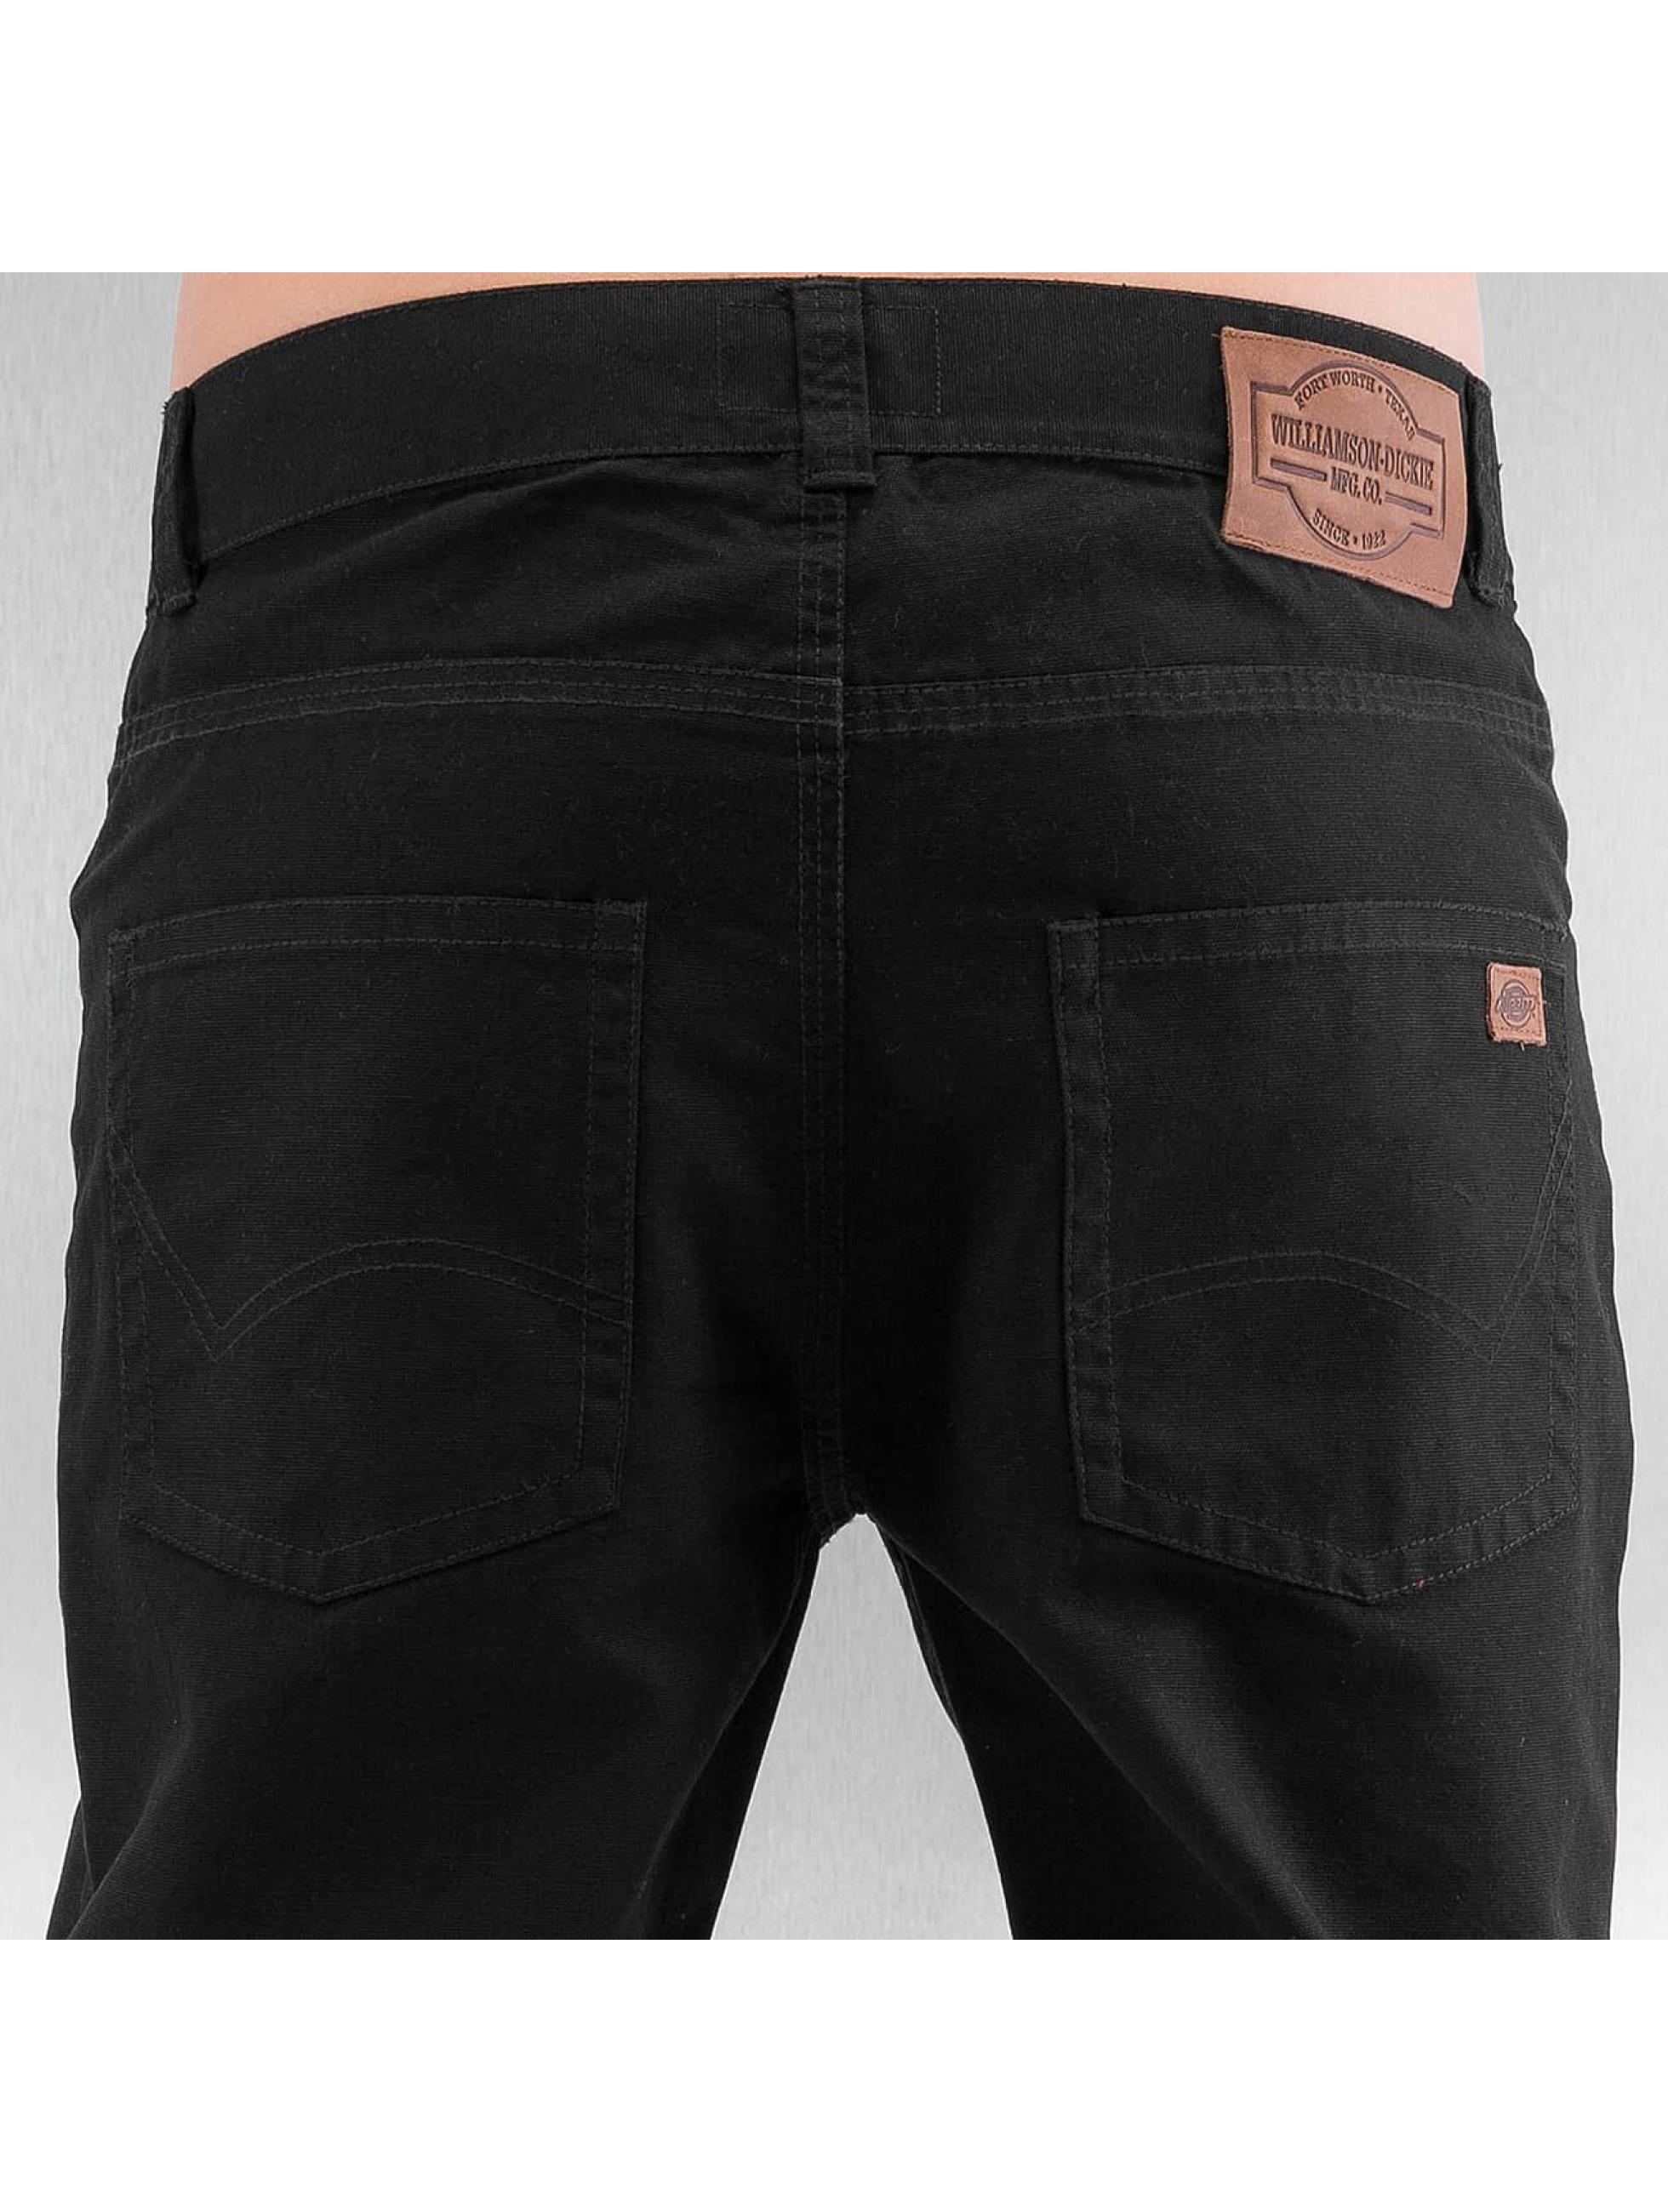 dickies herren jeans straight fit jeans alamo ebay. Black Bedroom Furniture Sets. Home Design Ideas